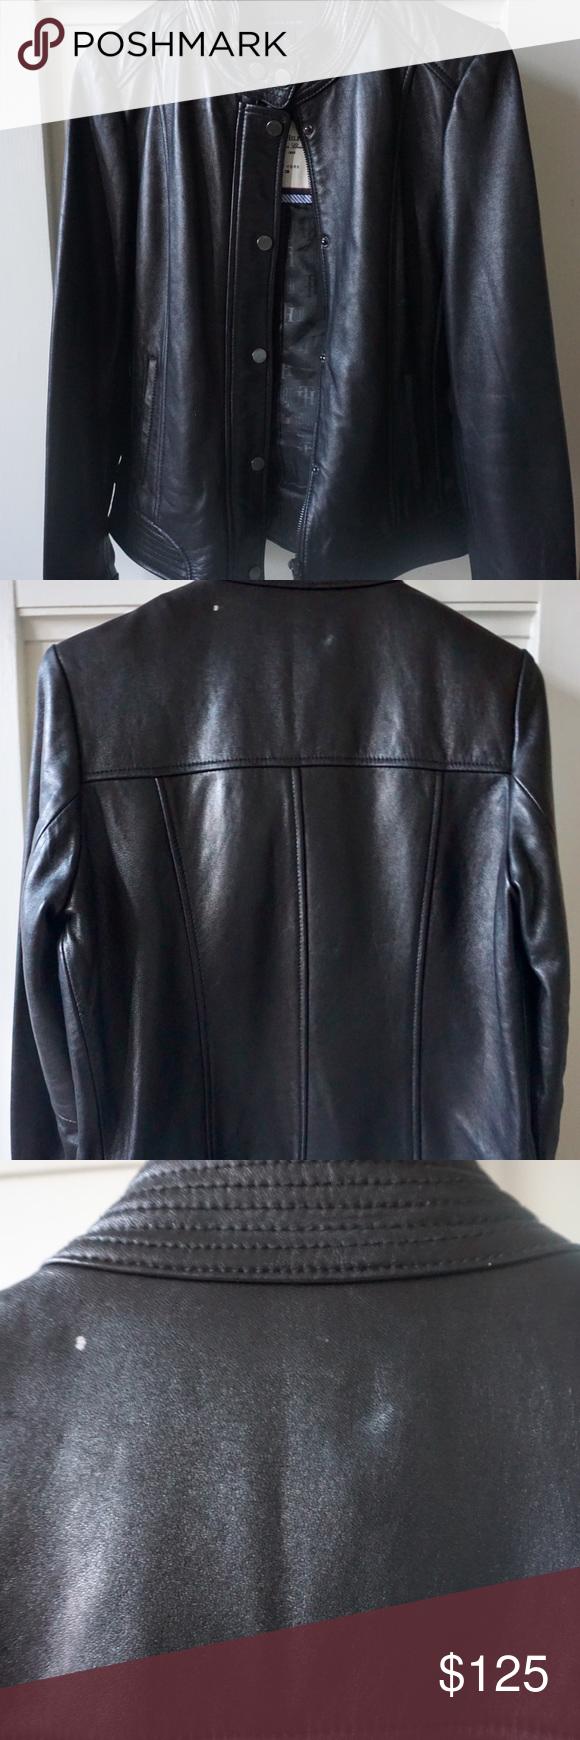 black Tommy Hilfiger leather jacket Leather jacket